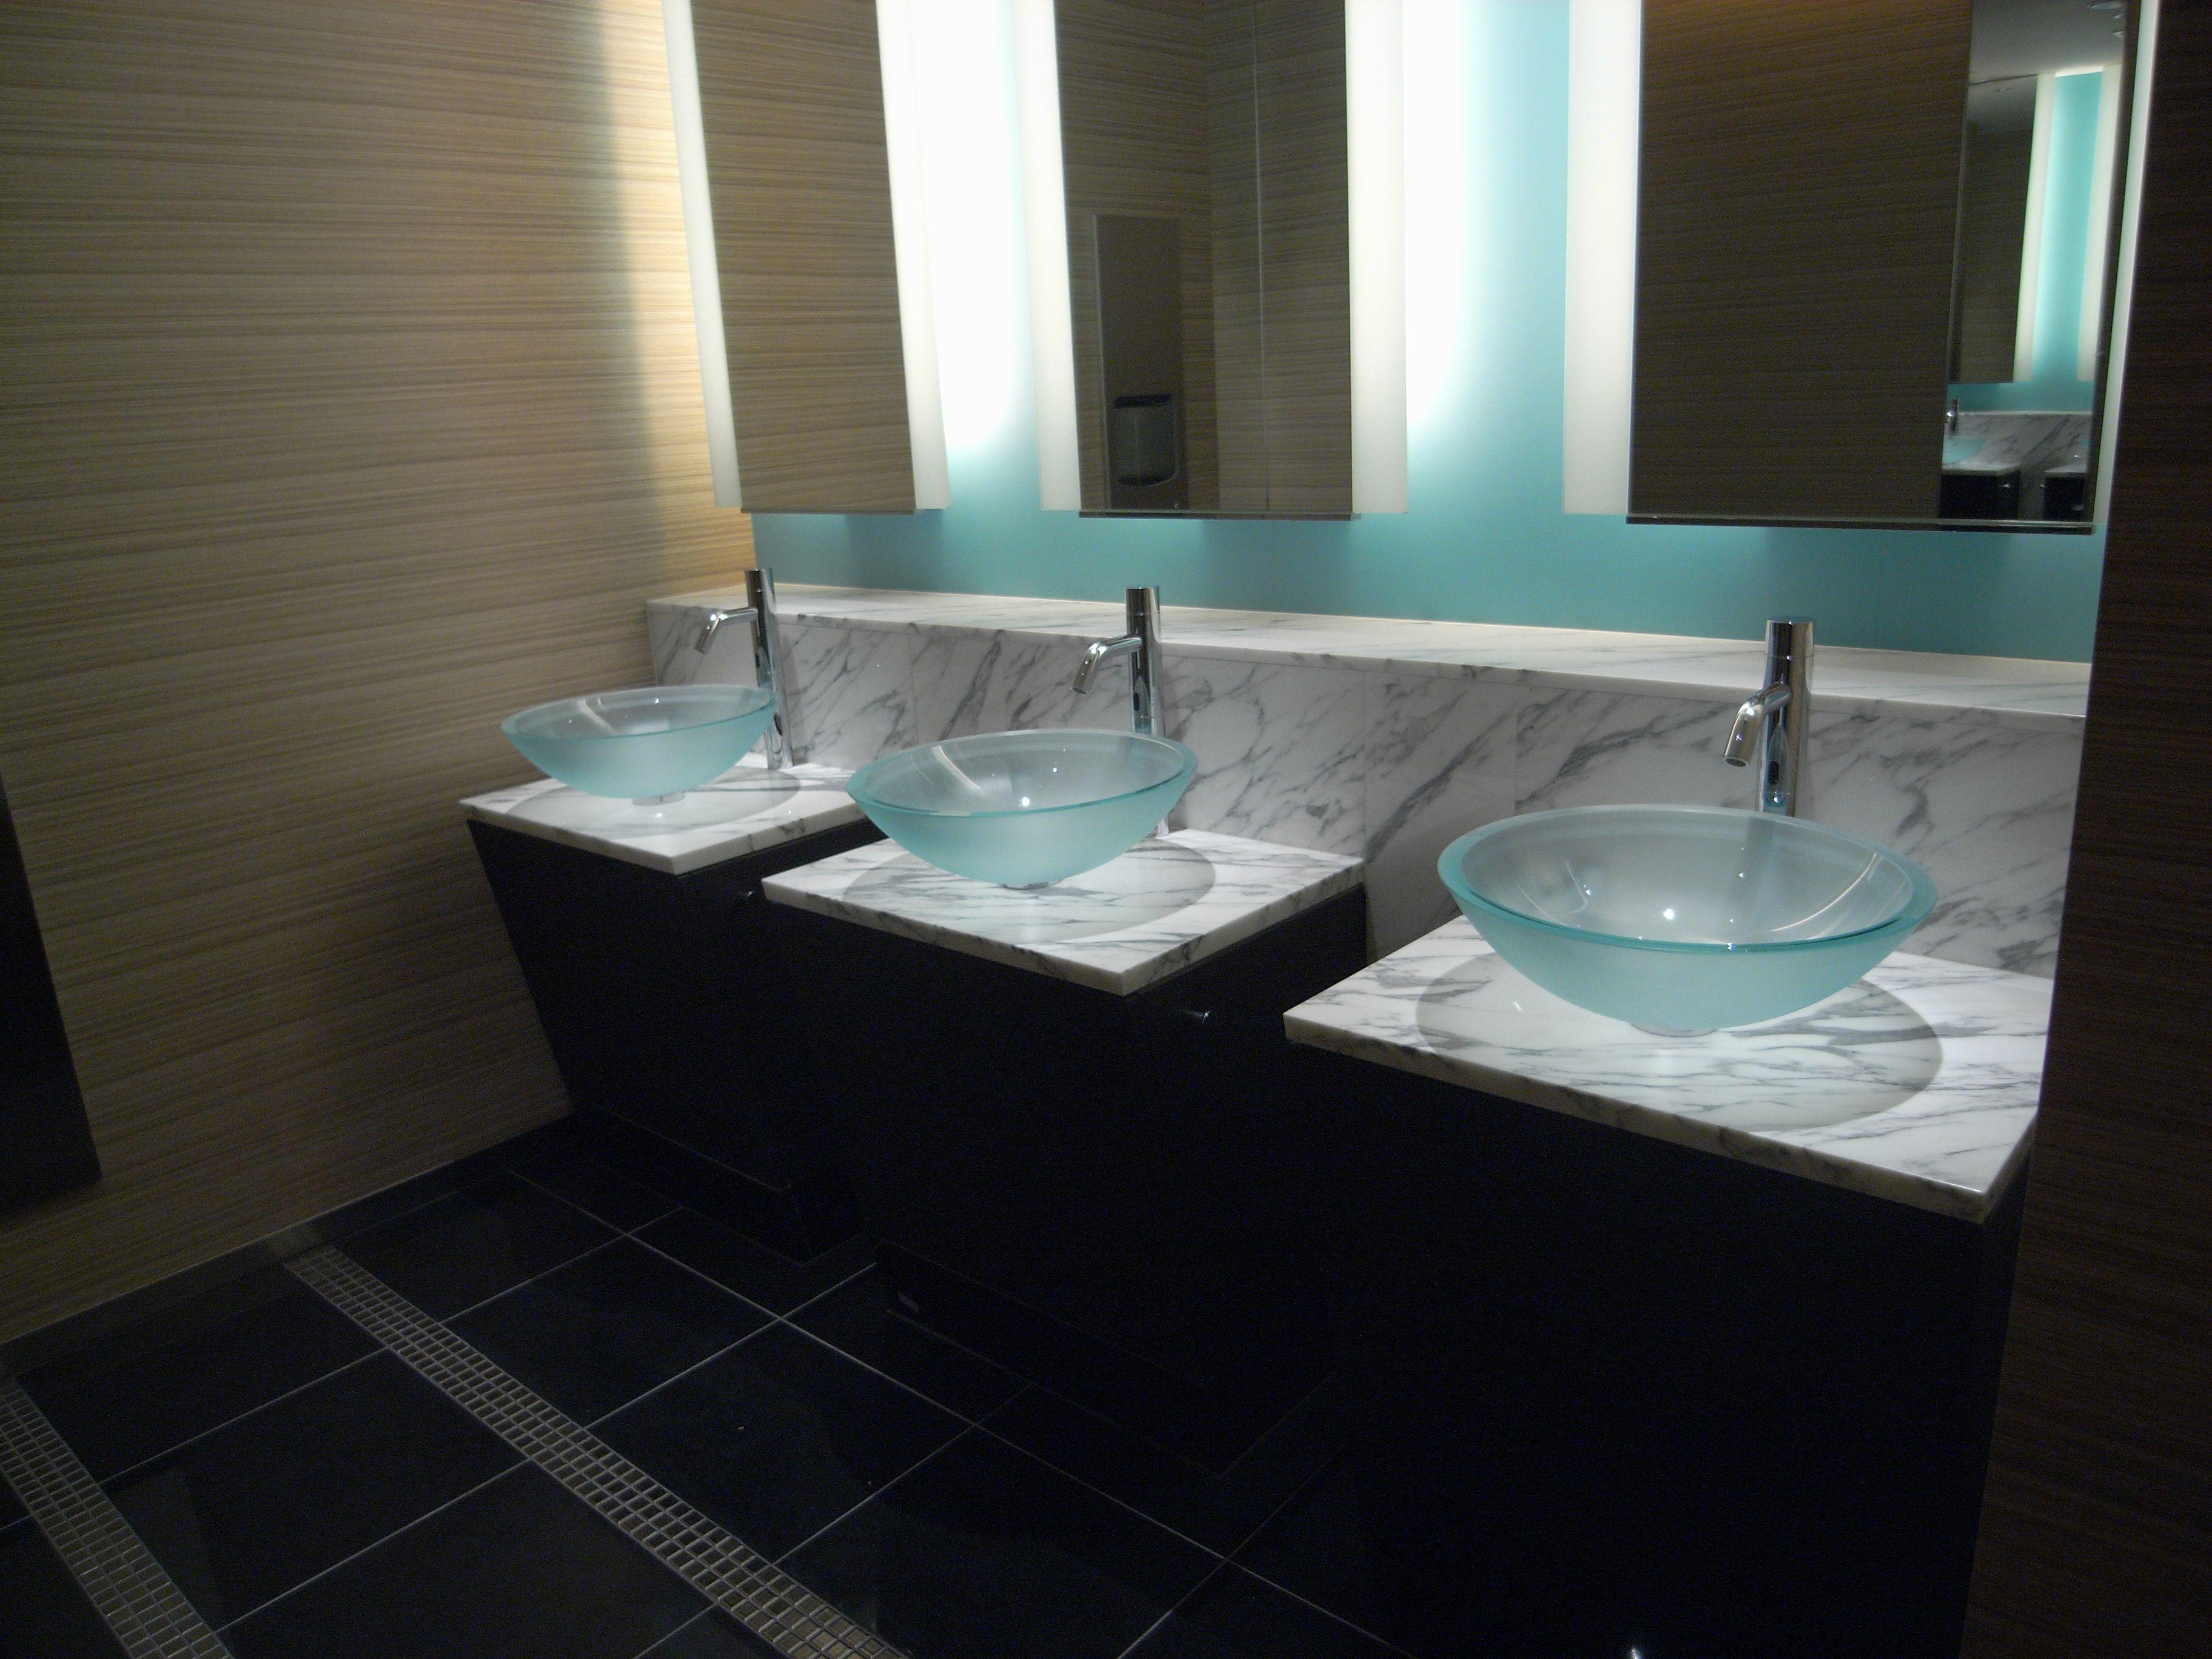 Extreme Plus touch free faucet at New Otani Hotel, Yokohama-Japan ...